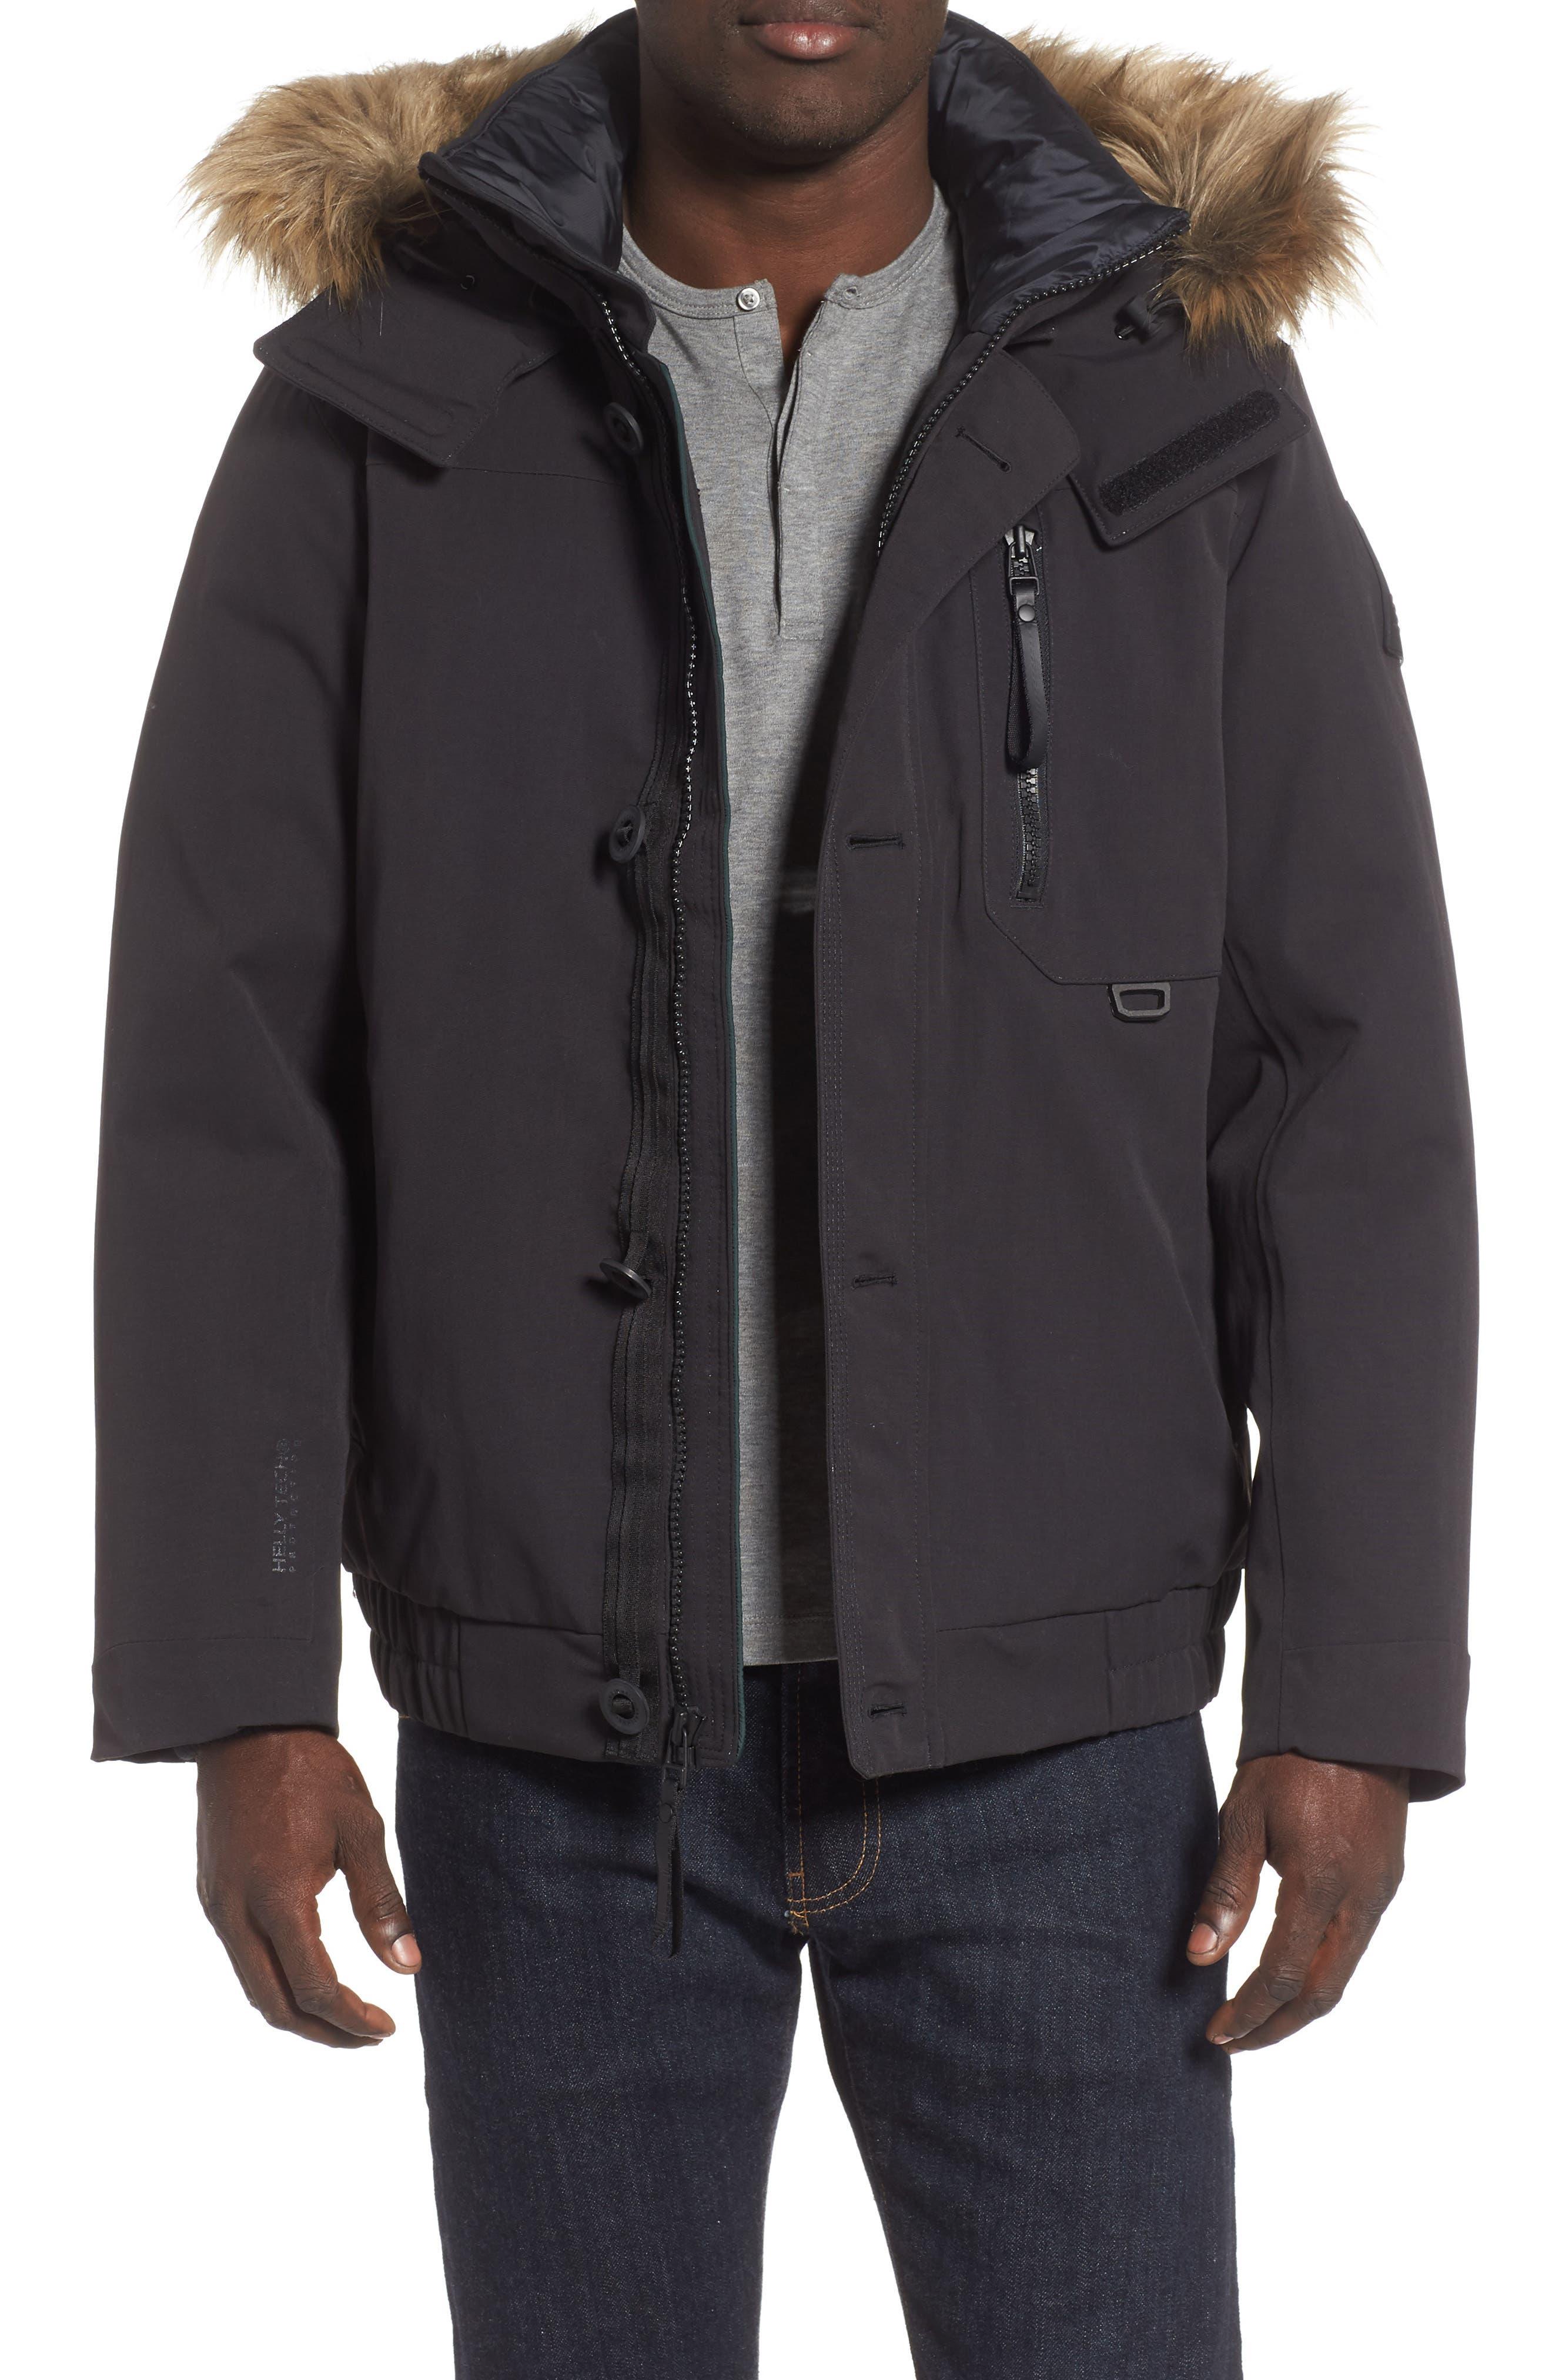 Bardu Waterproof Bomber Jacket with Detachable Hood and Faux Fur Trim,                             Main thumbnail 1, color,                             BLACK